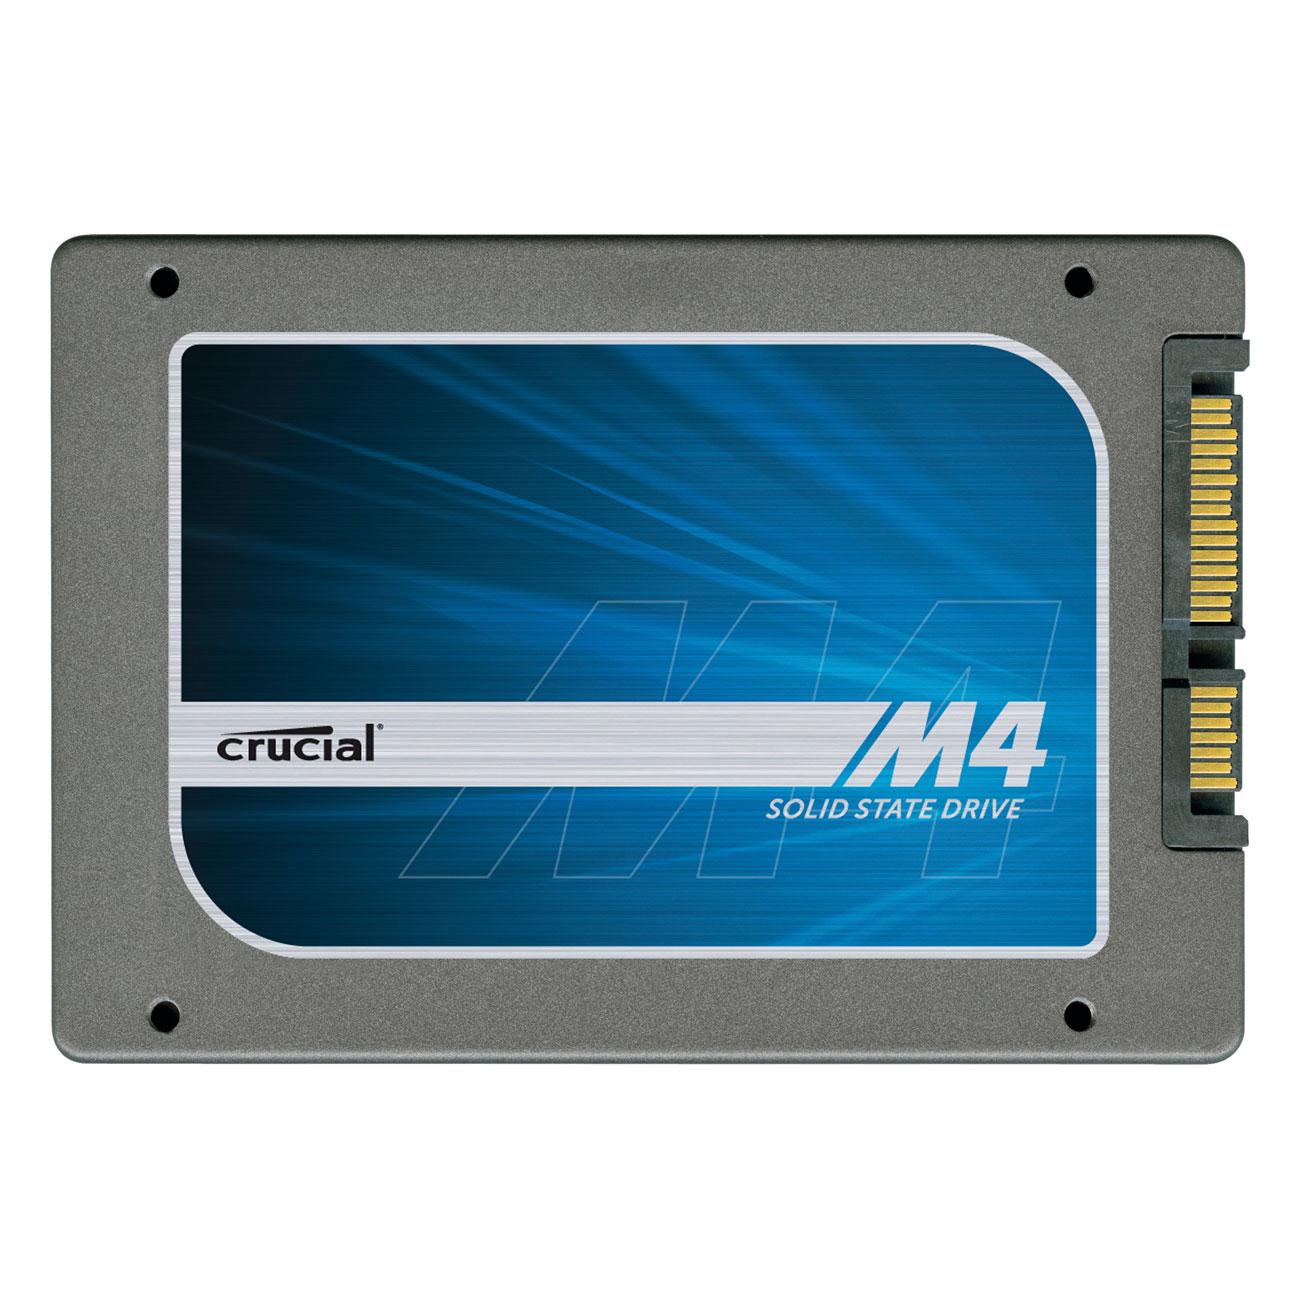 "Disque SSD Crucial M4 512 Go 7mm SSD 512 Go 2.5"" Serial ATA 6Gb/s"